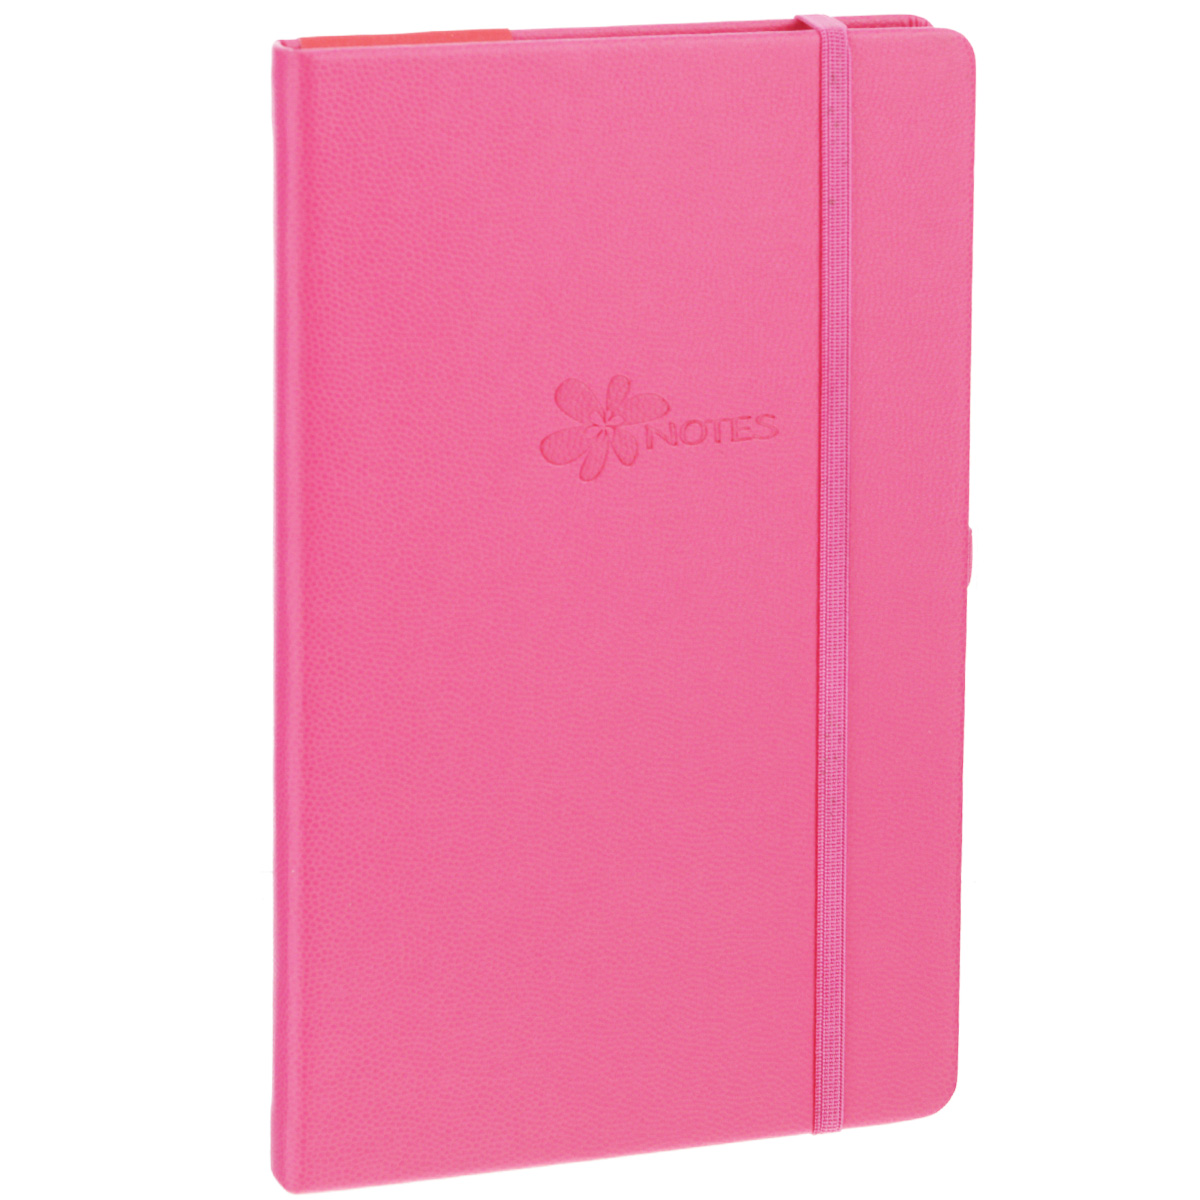 "Записная книжка Erich Krause ""Flower"", цвет: розовый, 96 листов"